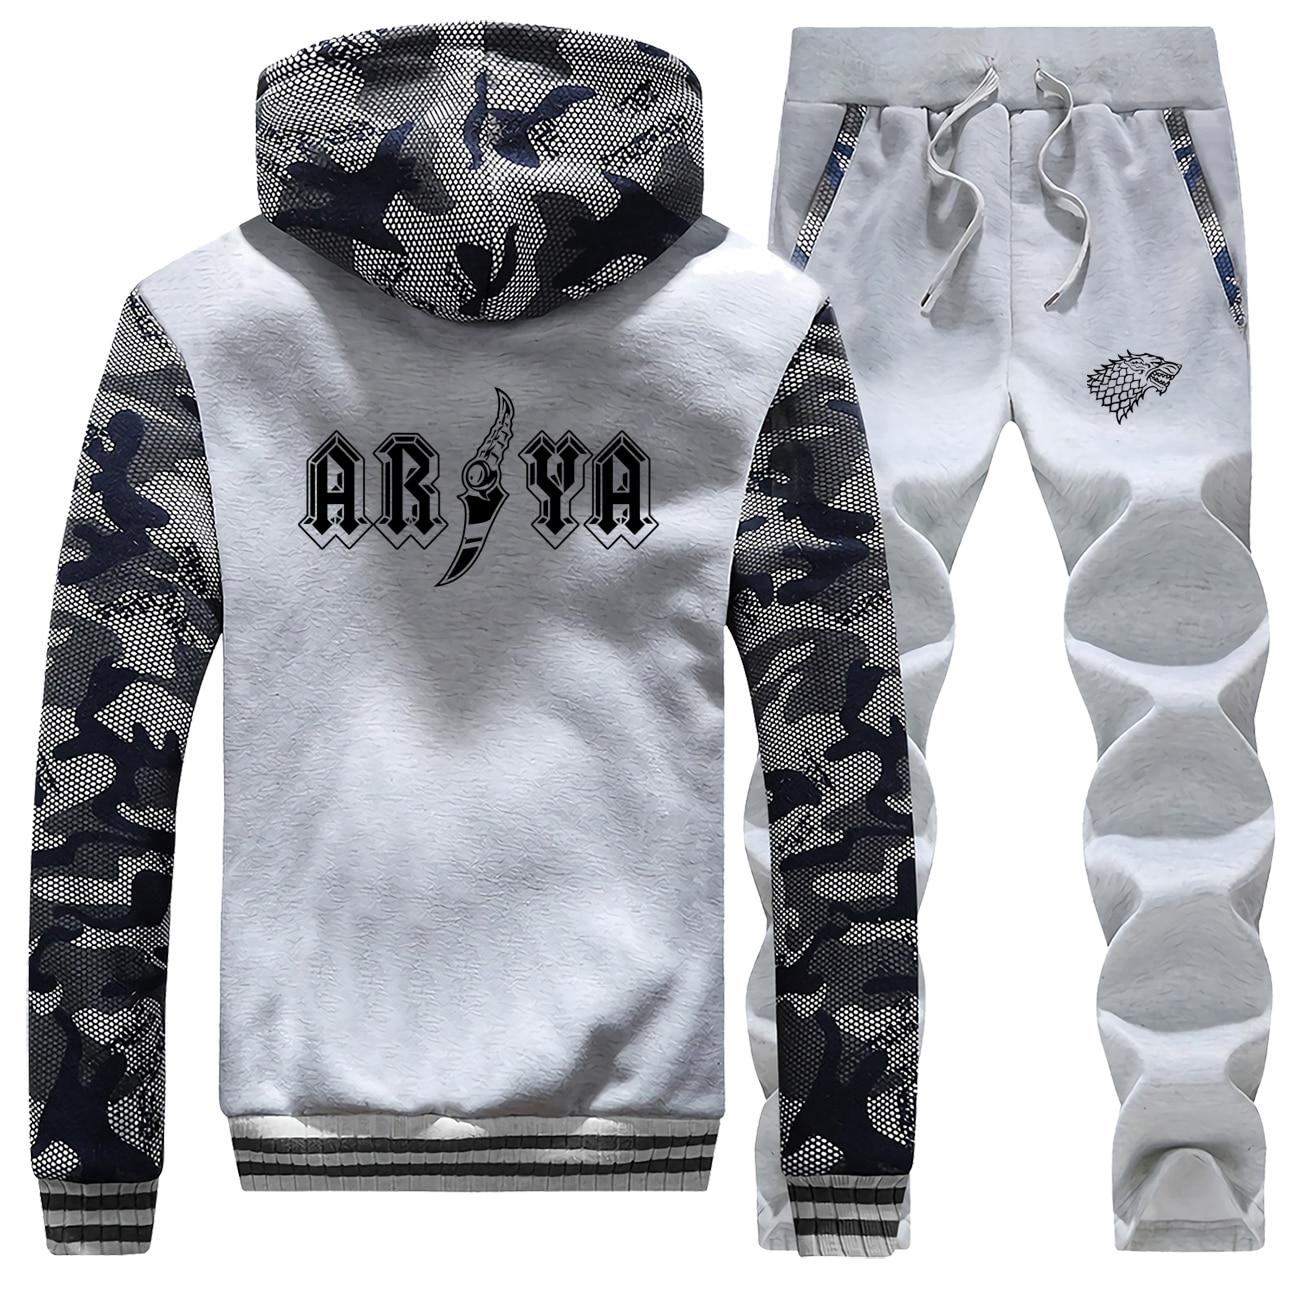 Game Of Thrones Brand Man Tracksuit Fashion House Stark Sportsman Wear Arya Stark Camo Thick Set Fleece Warm Pants Sweatshirts